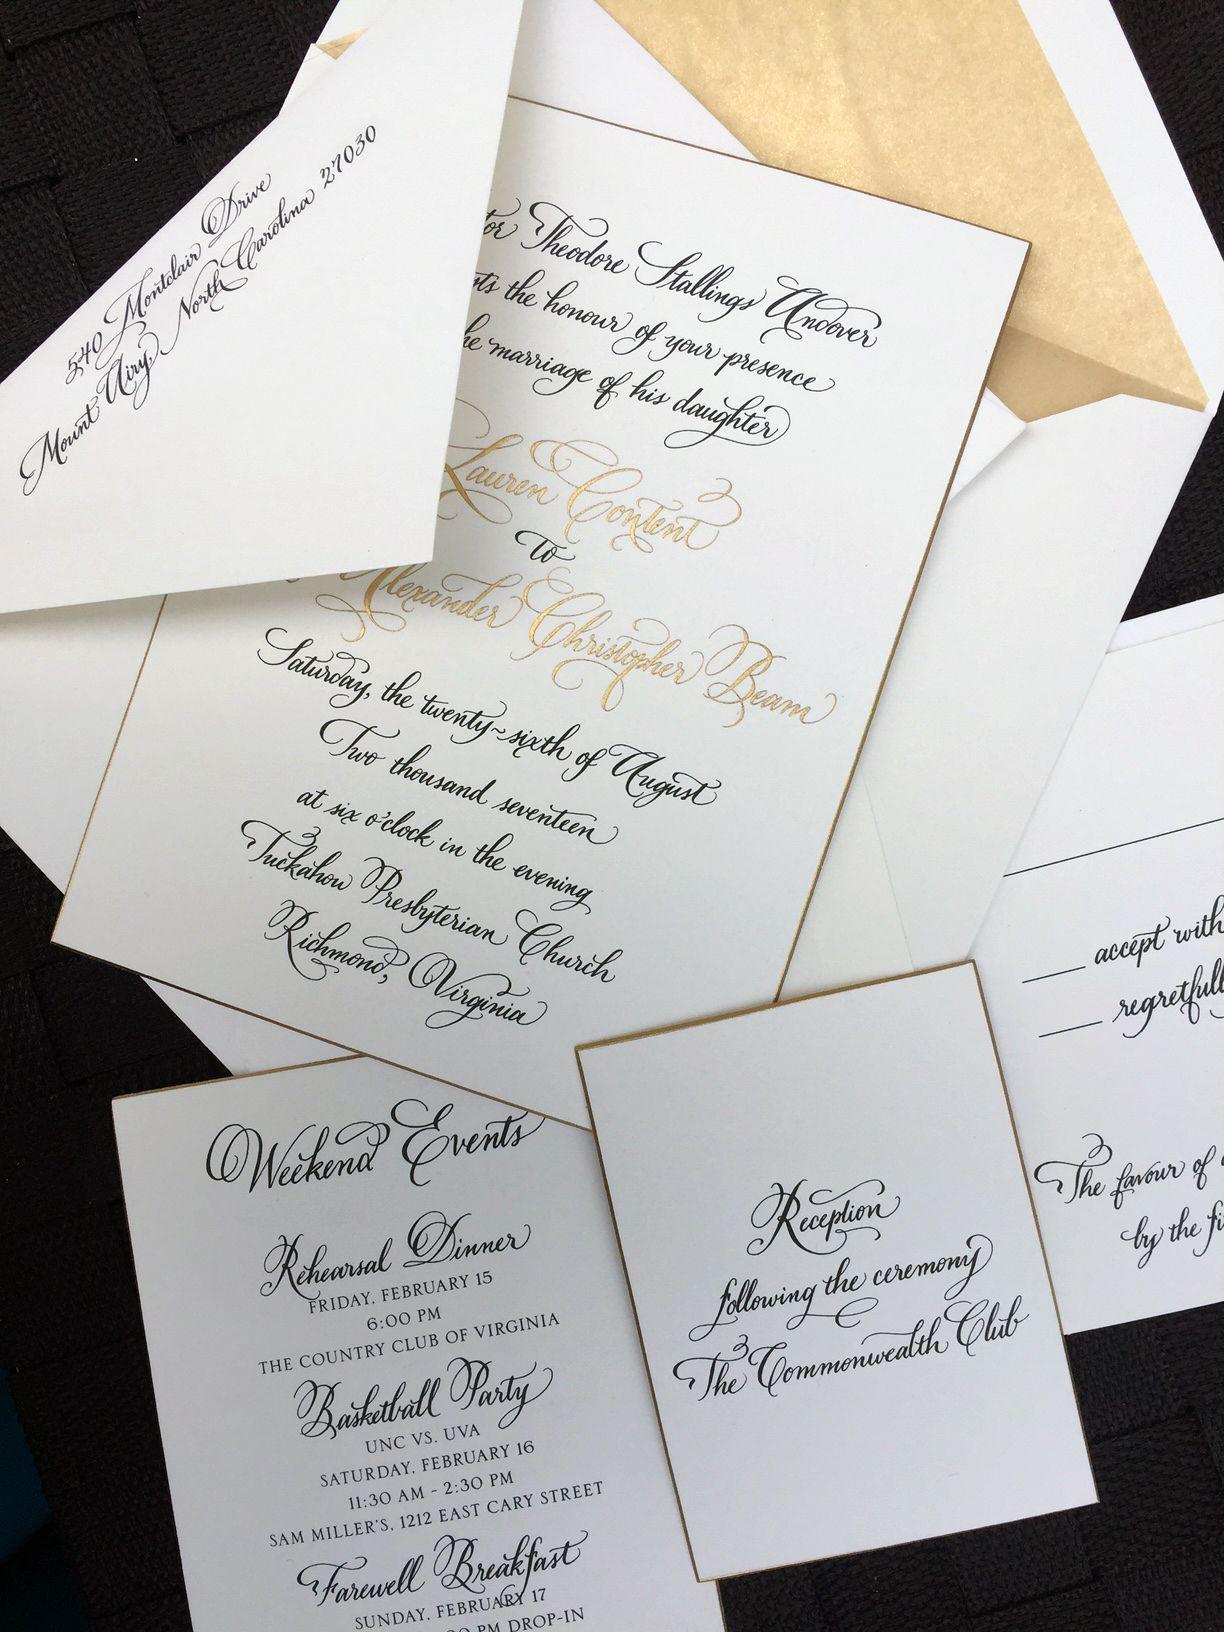 Hand calligraphy wedding invitation from Jen Maton of If